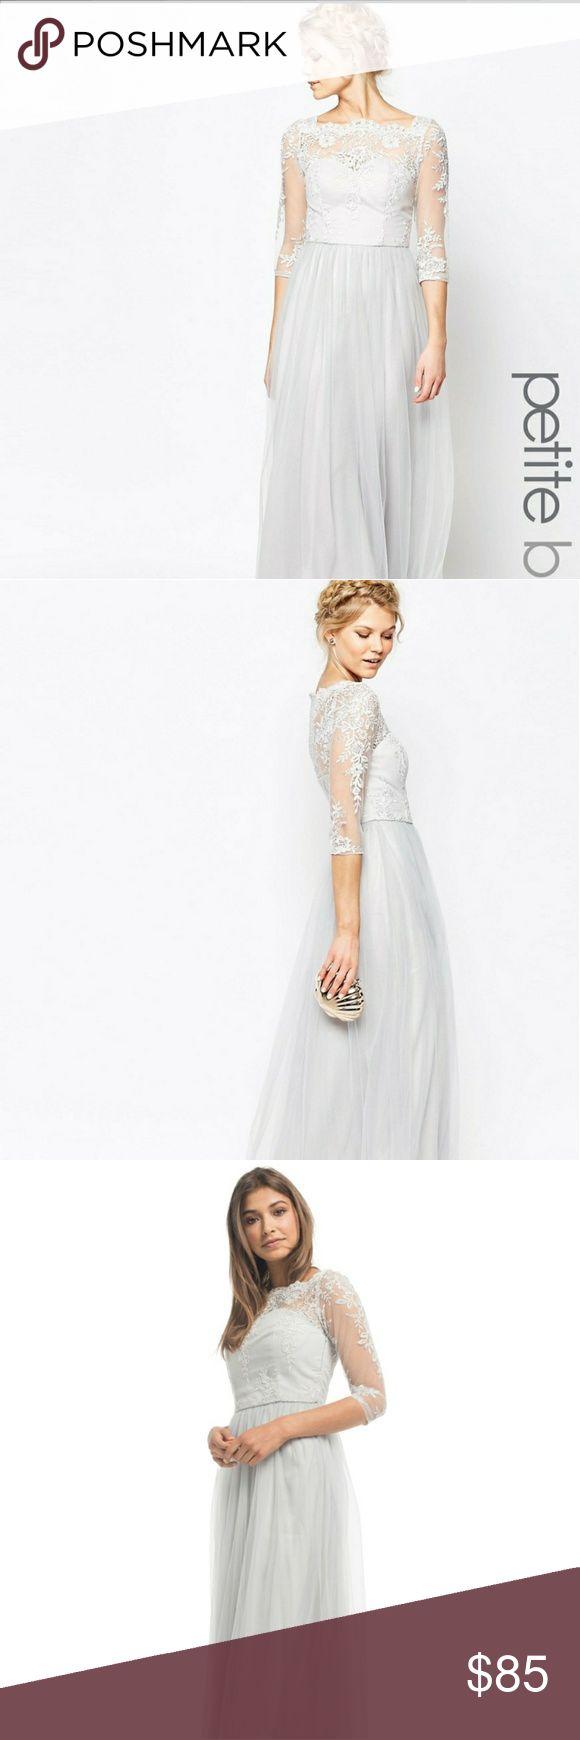 asos chi chi london petite long dress size 6us Beautiful chi chi London petite size 6us /10 uk dress, perfect special occasion dress: bridesmaid, wedding guest . Color is a light gray. ASOS Petite Dresses Maxi